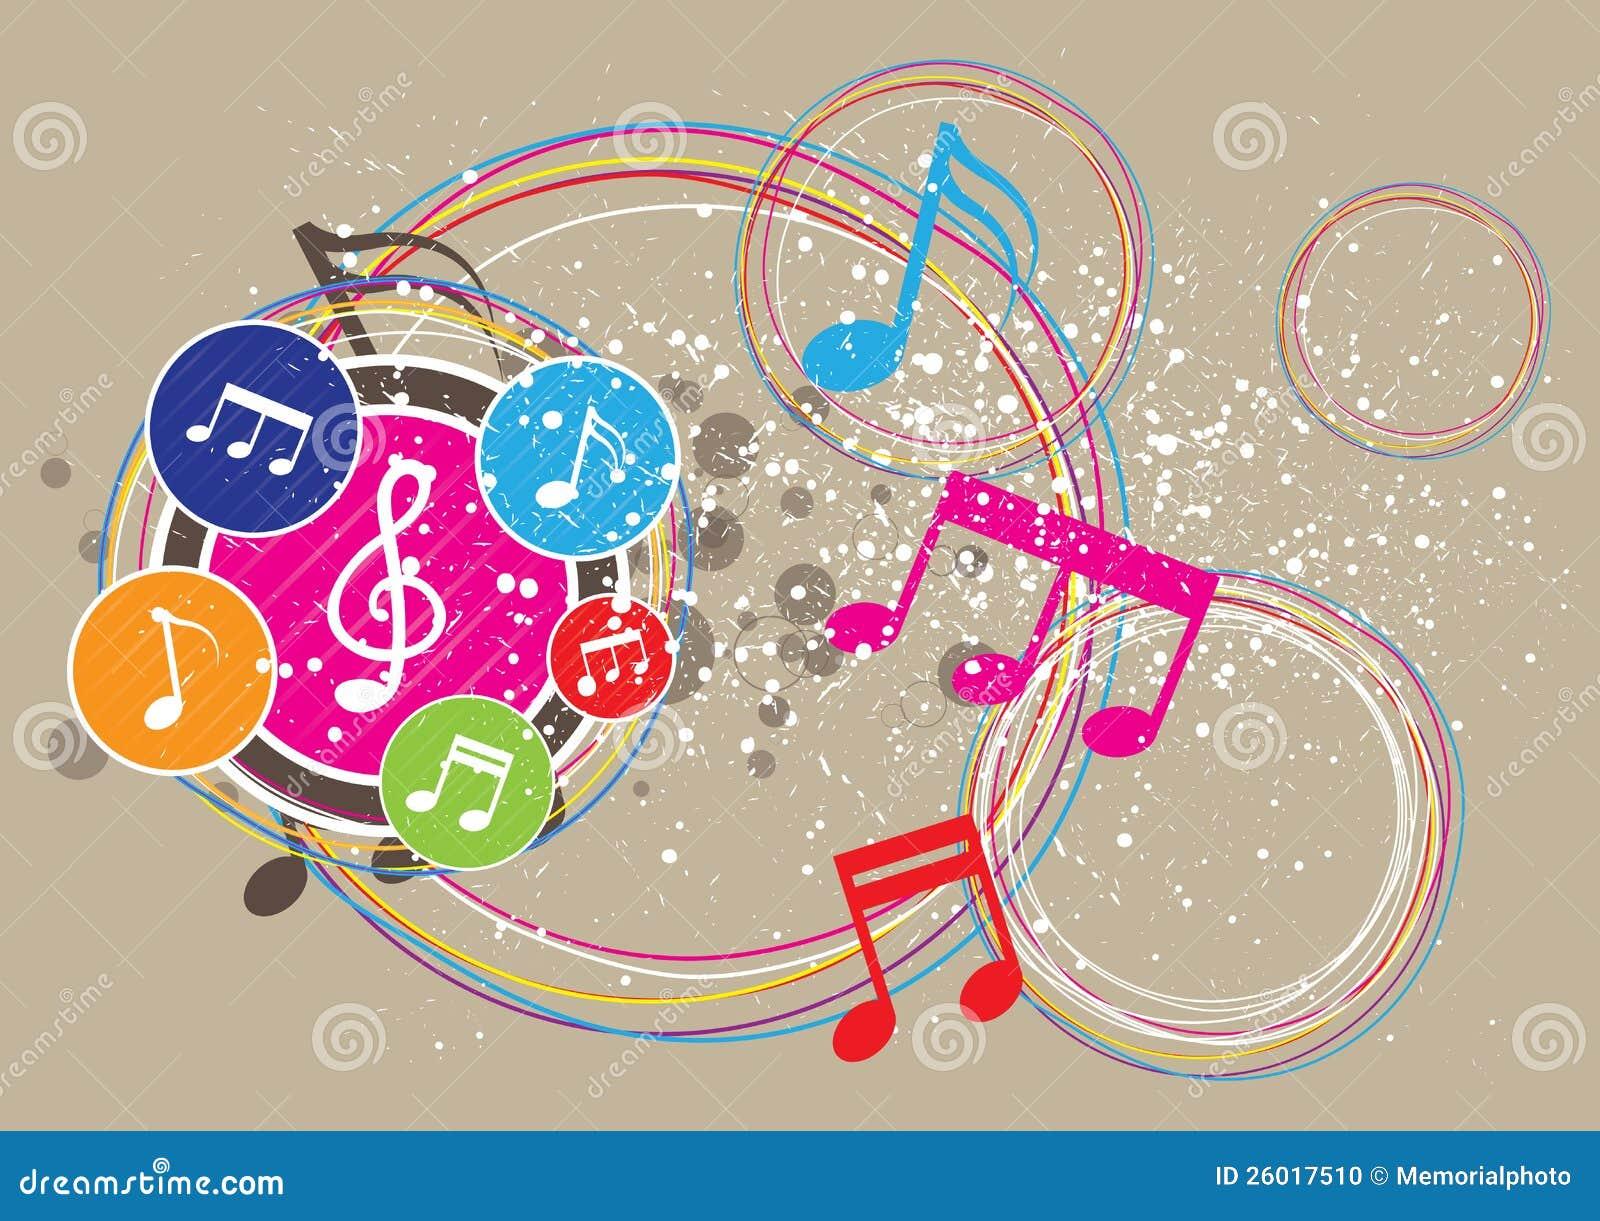 Music Festival Background Design Stock Photo - Image: 26017510